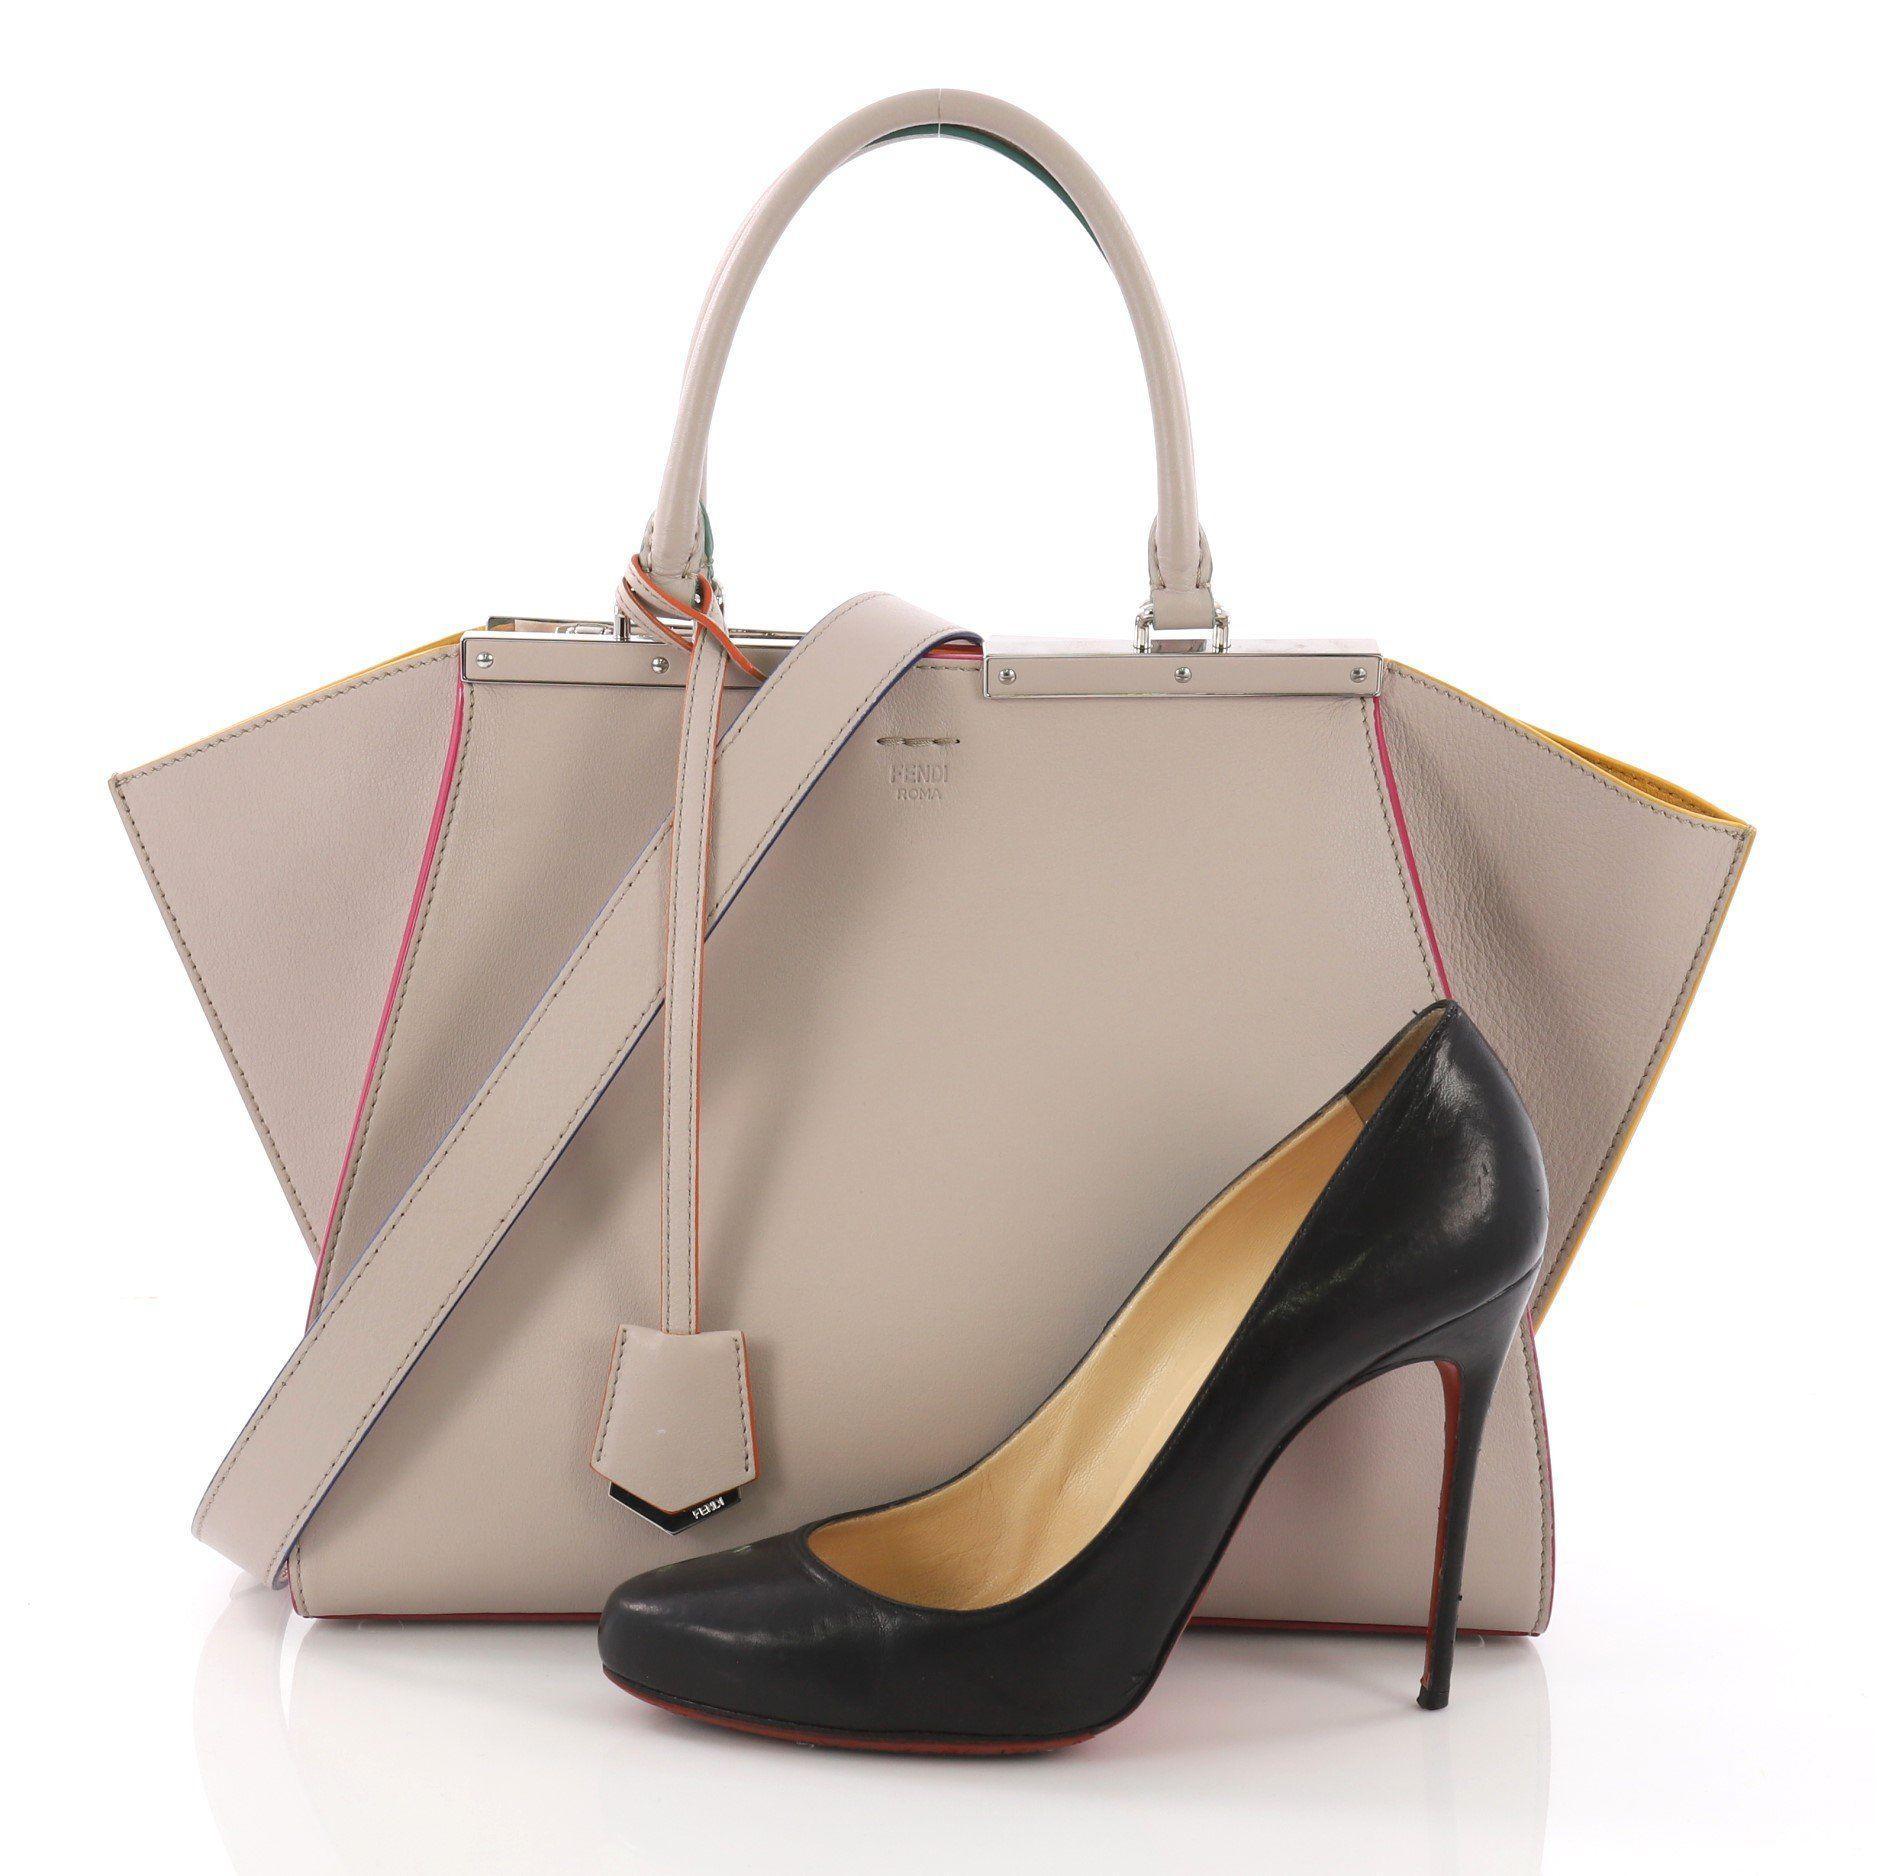 2611443a46a1 Lyst - Fendi Pre Owned Petite 3jours Handbag Leather